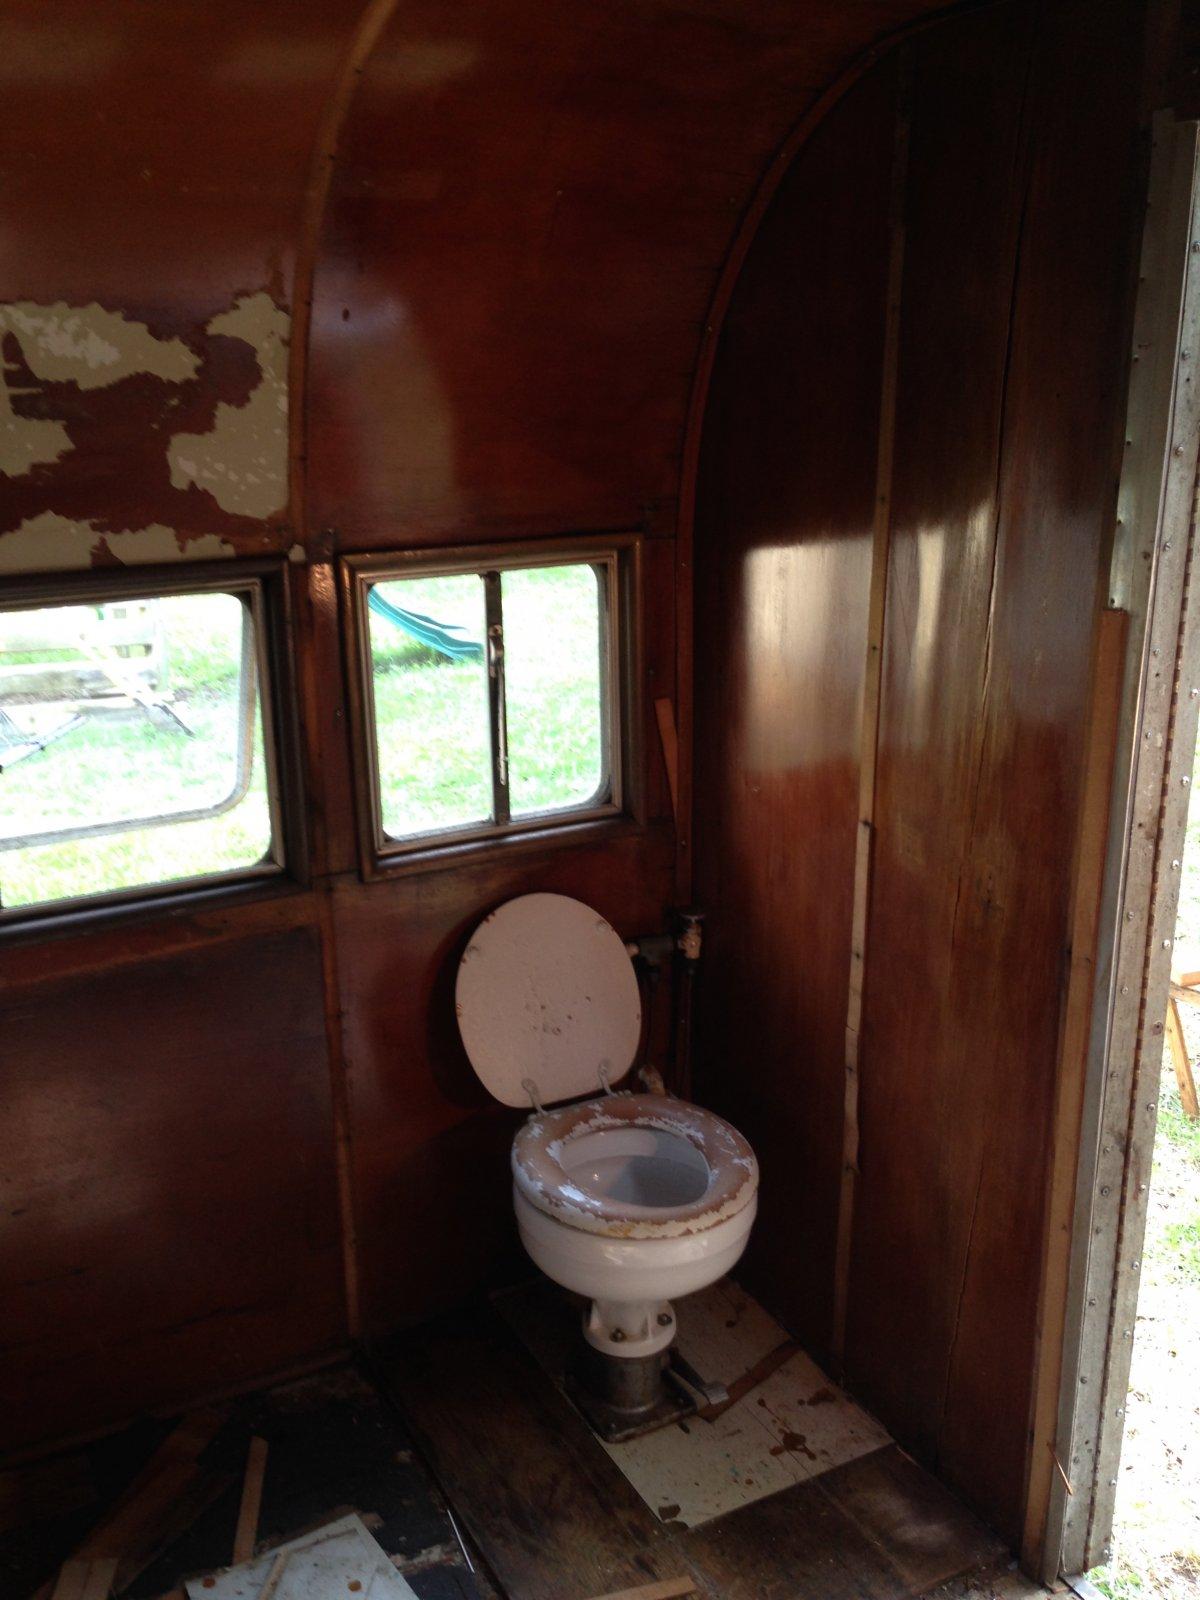 Click image for larger version  Name:bathroomremoved.jpg Views:66 Size:188.9 KB ID:245120